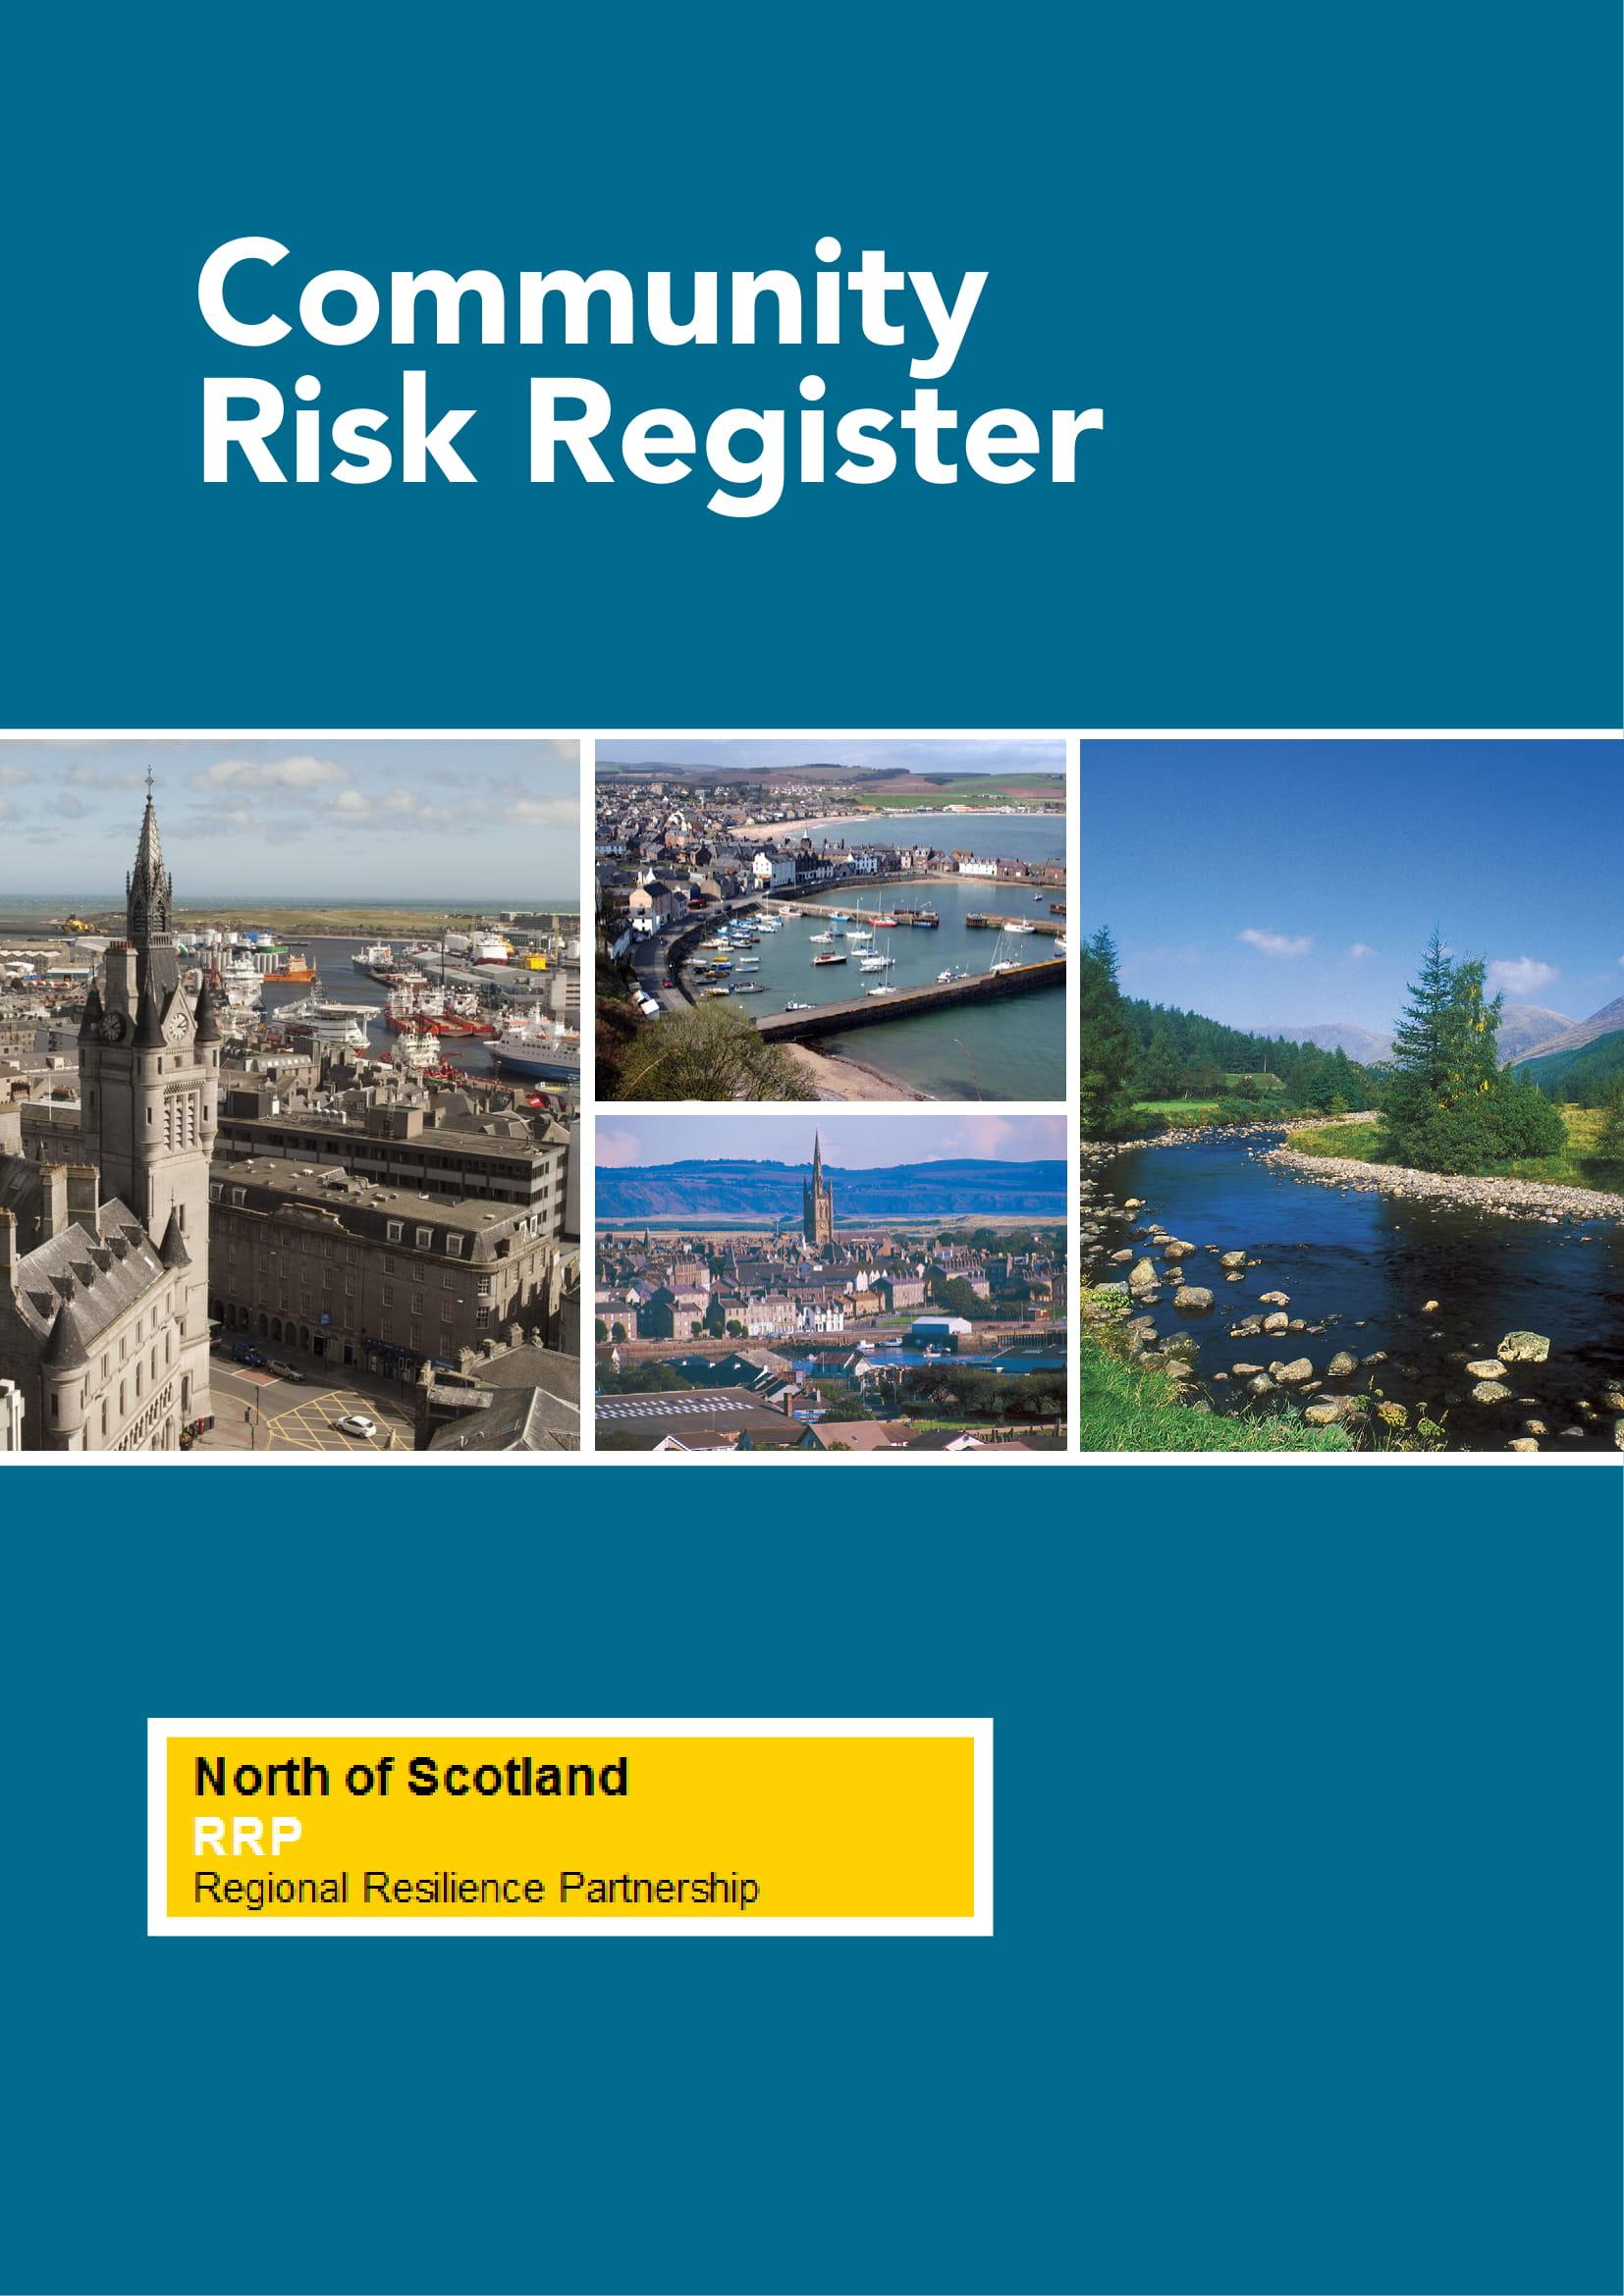 community risk register example